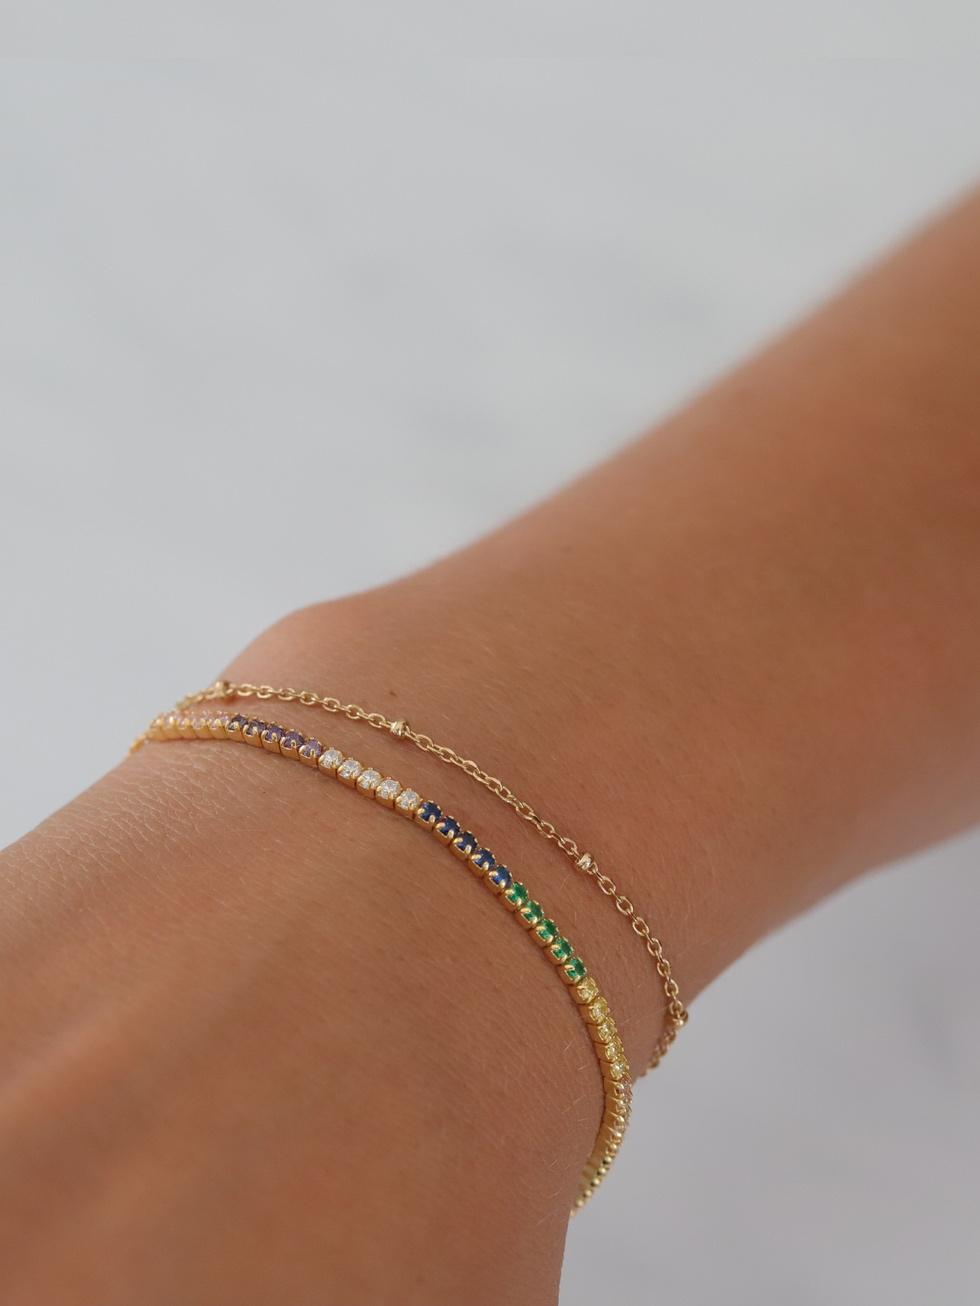 Bracelet rainbow gold mod3